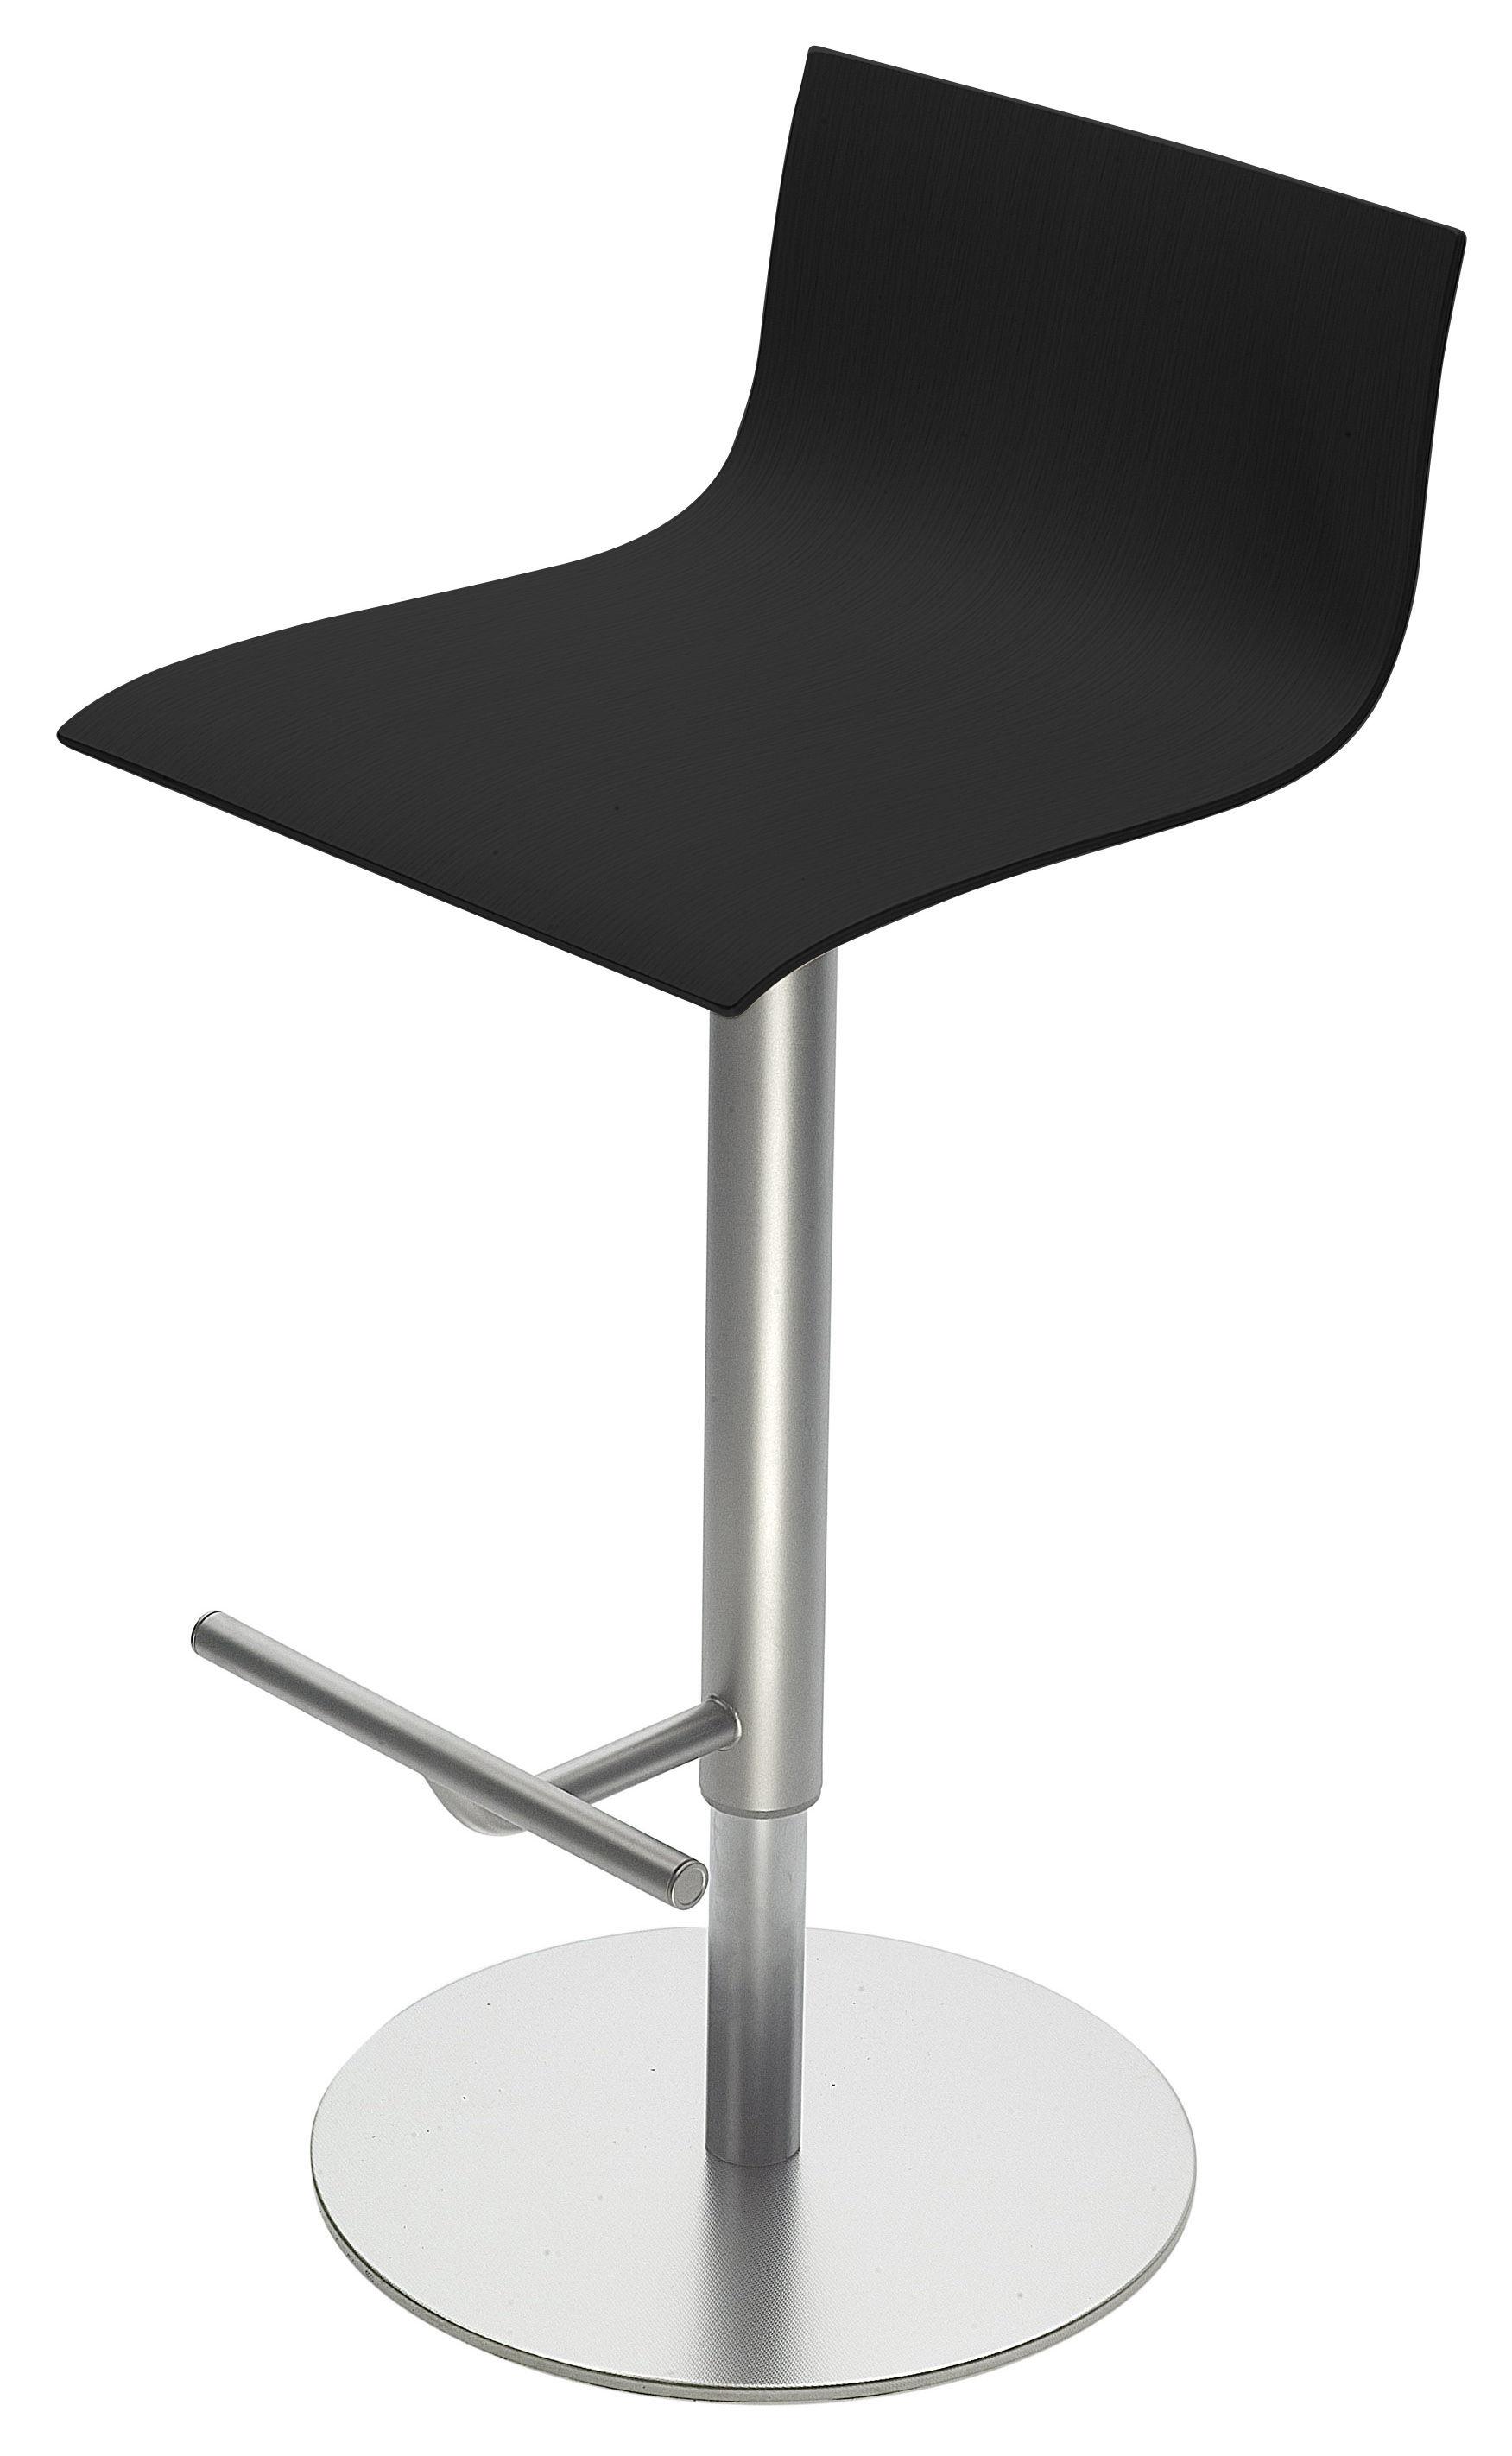 Furniture - Bar Stools - Thin Adjustable bar stool - Pivoting wood seat by Lapalma - Black oak - Oak plywood, Sandy steel